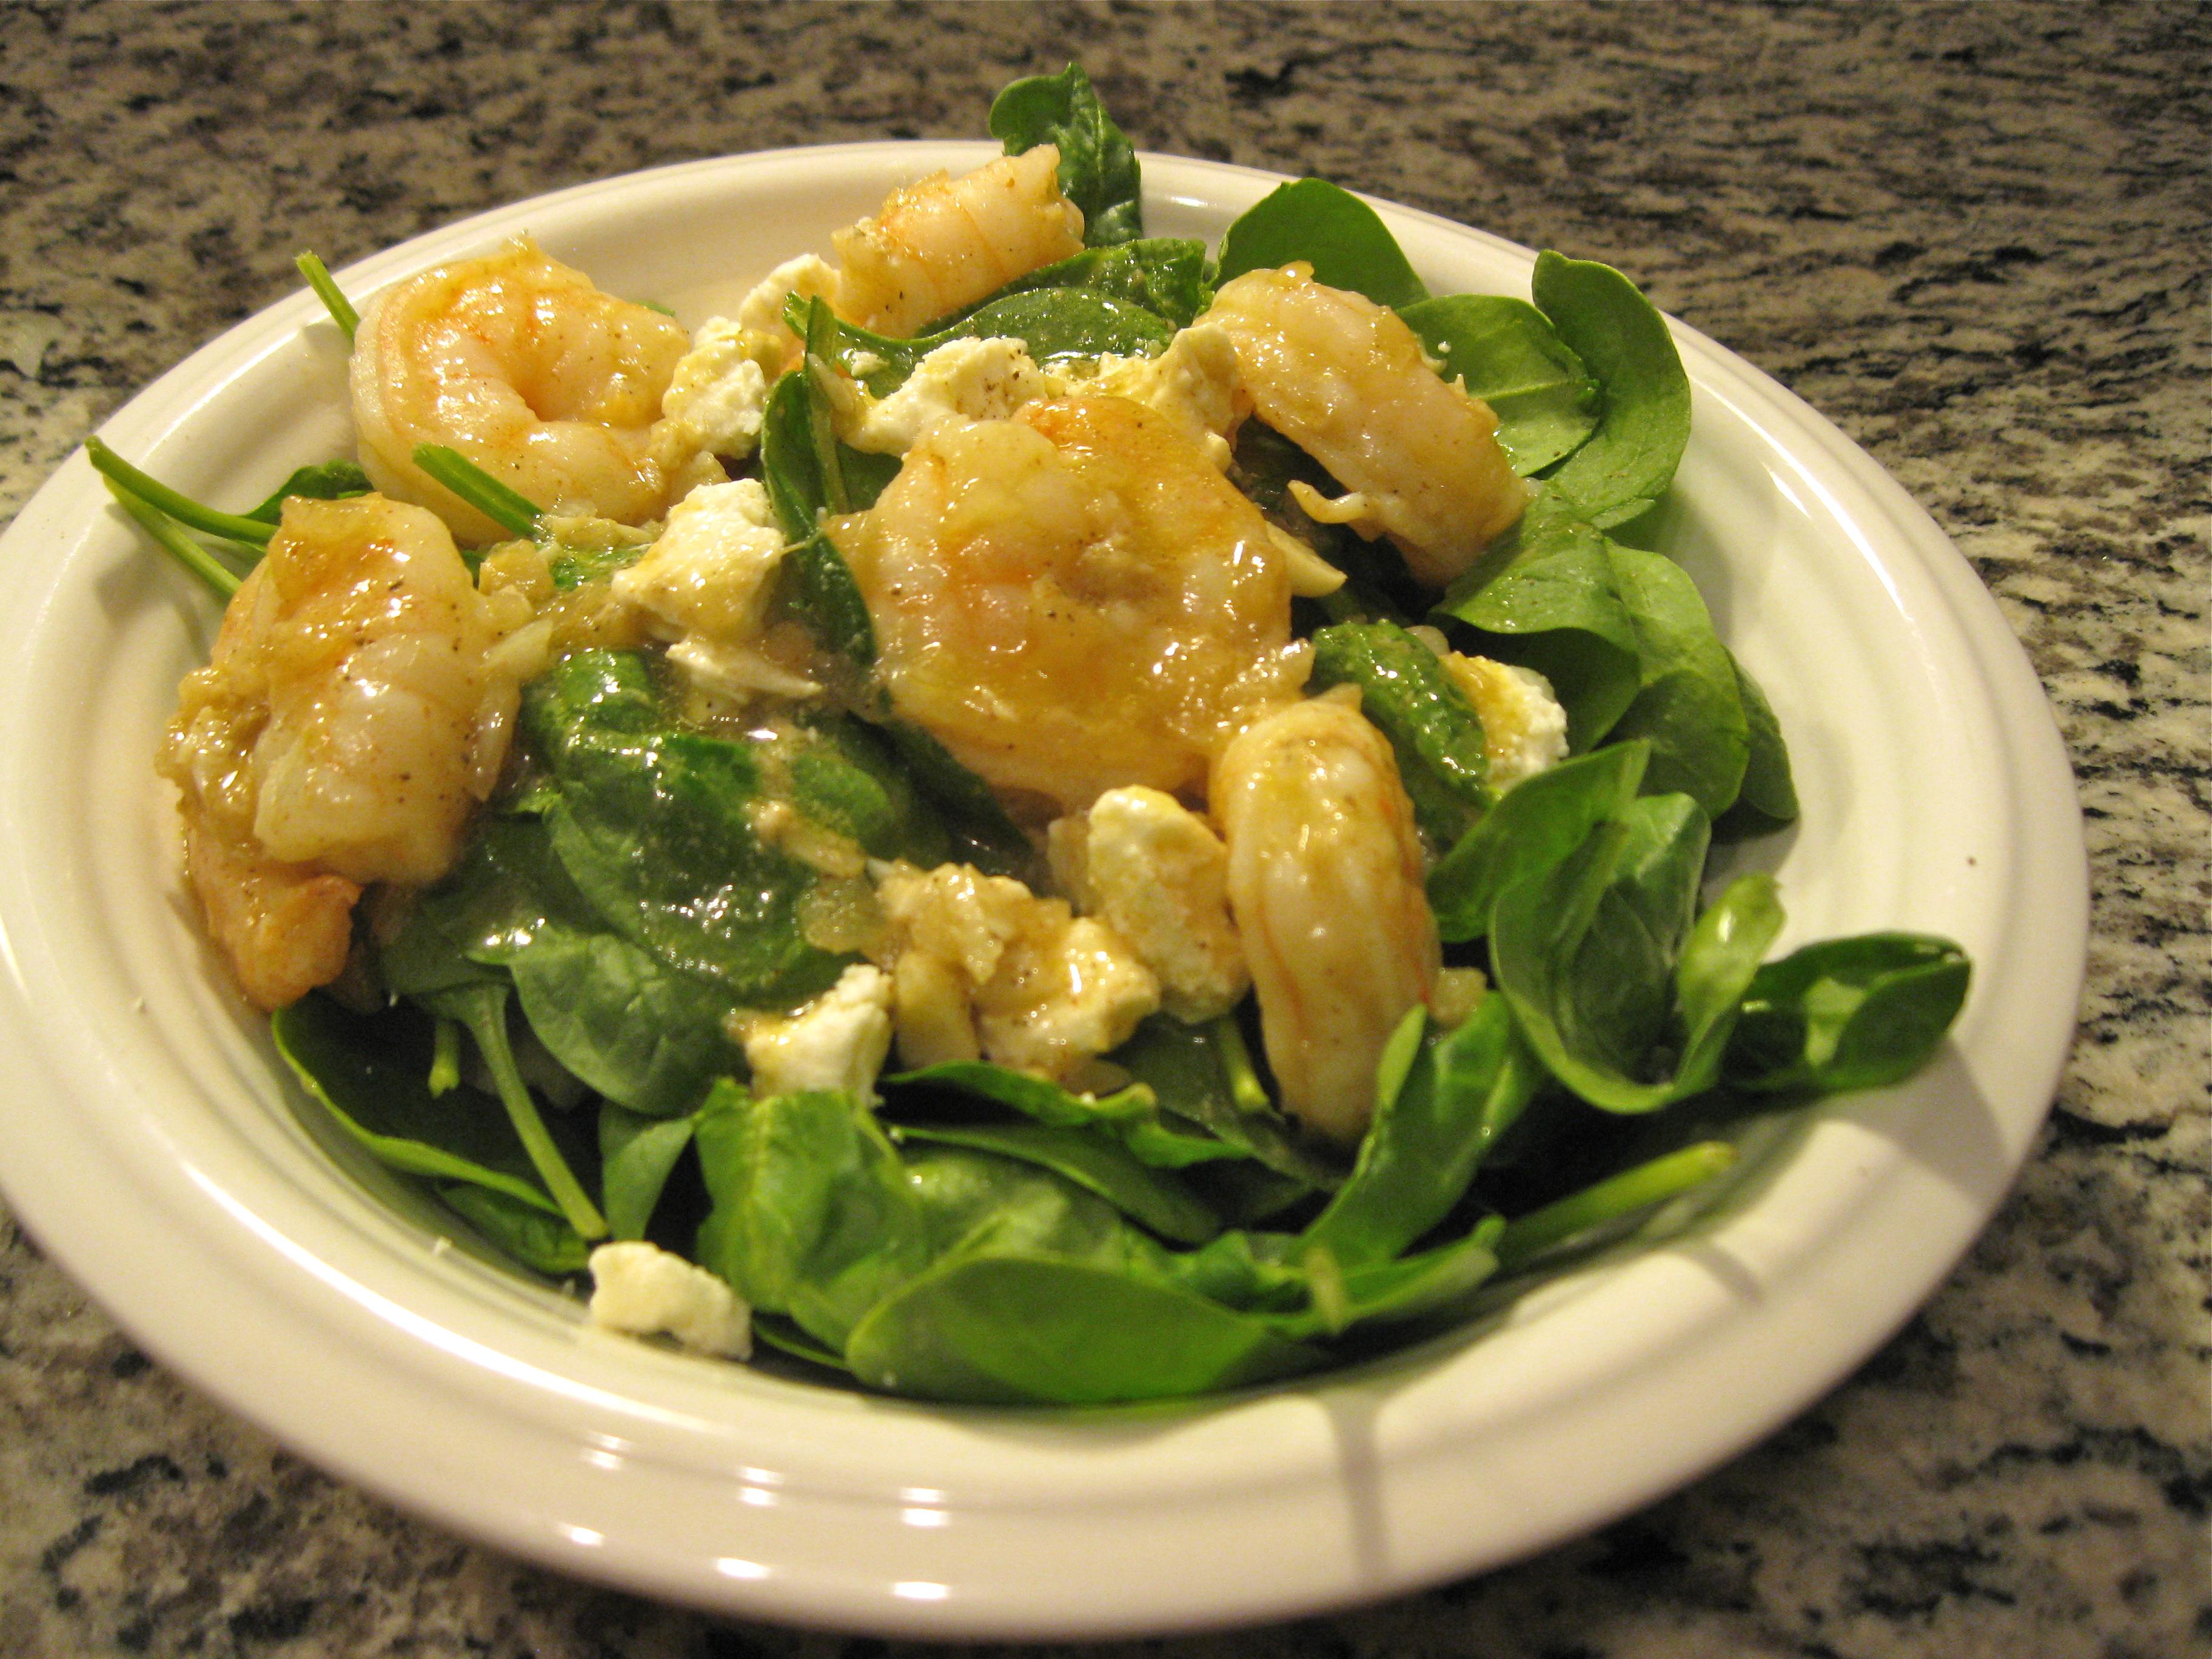 Recipe 17.3: Warm Shrimp and Spinach Salad